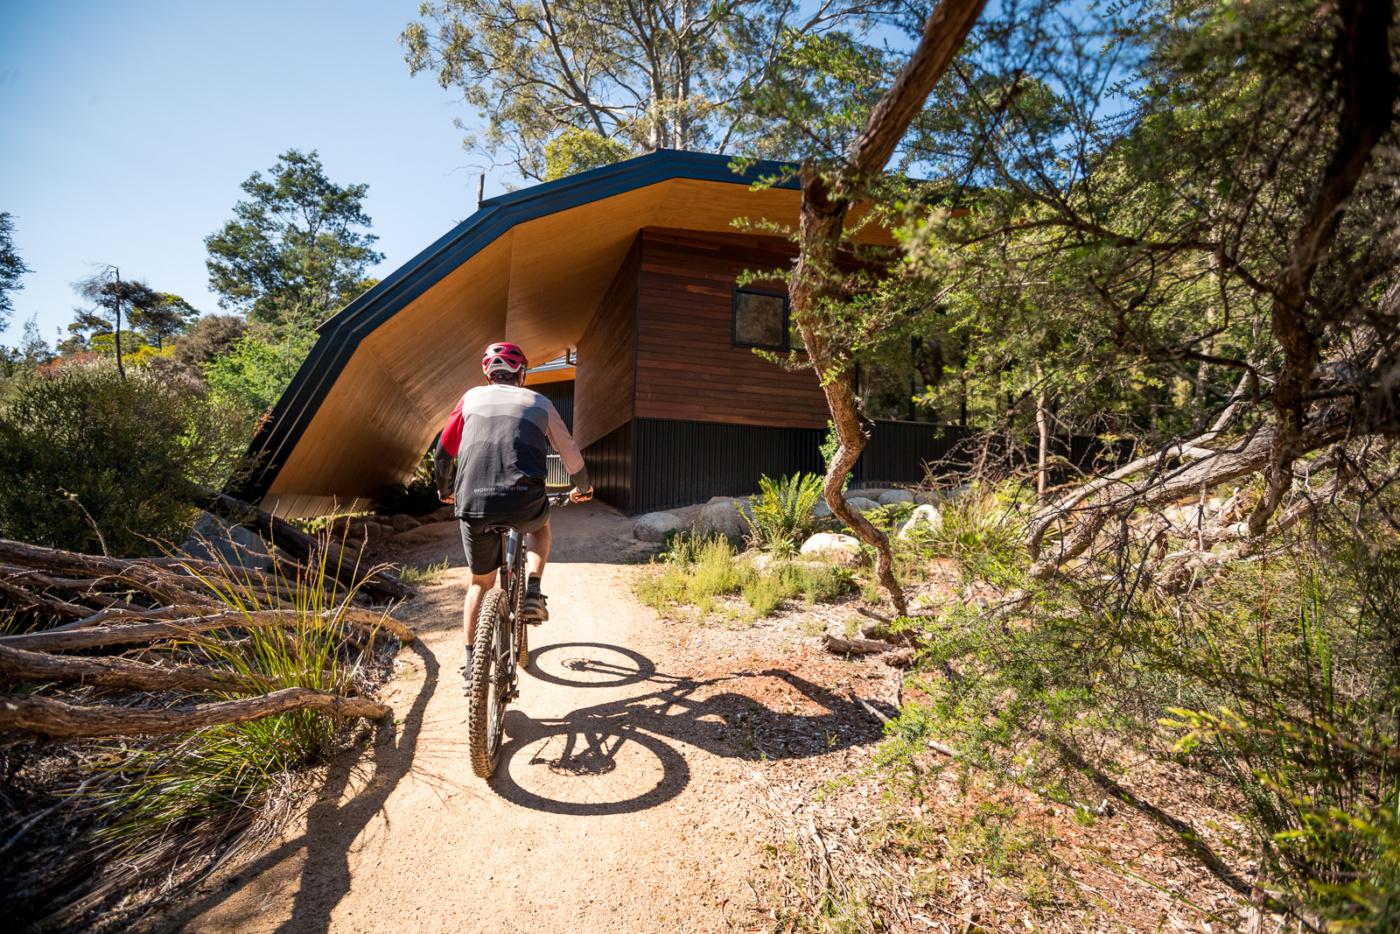 Image credit: Australian Mountain Bike Magazine